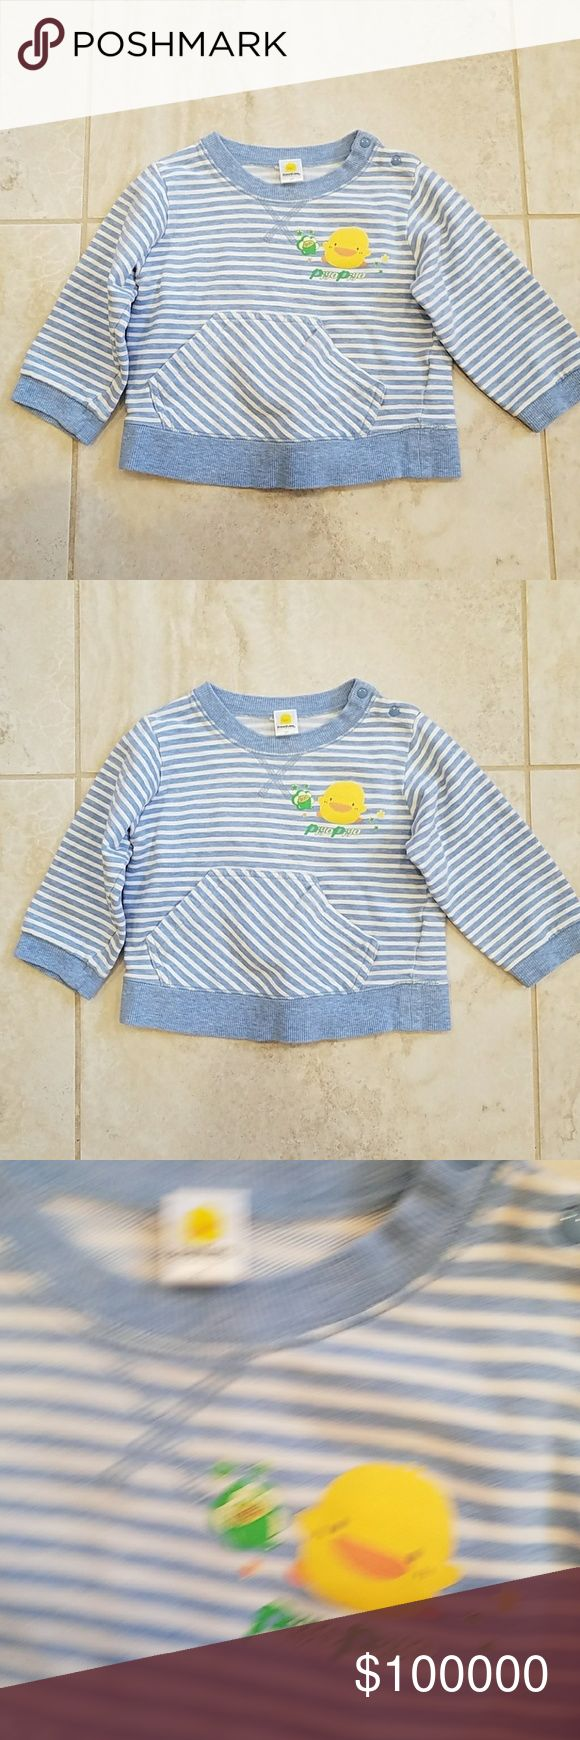 2T PIYO PIYO long sleeve shirt 2T PIYO PIYO long sleeve shirt with thicker material. No stain or rip. It is in an excellent condition. 100% cotton. PIYO PIYO Shirts & Tops Sweatshirts & Hoodies